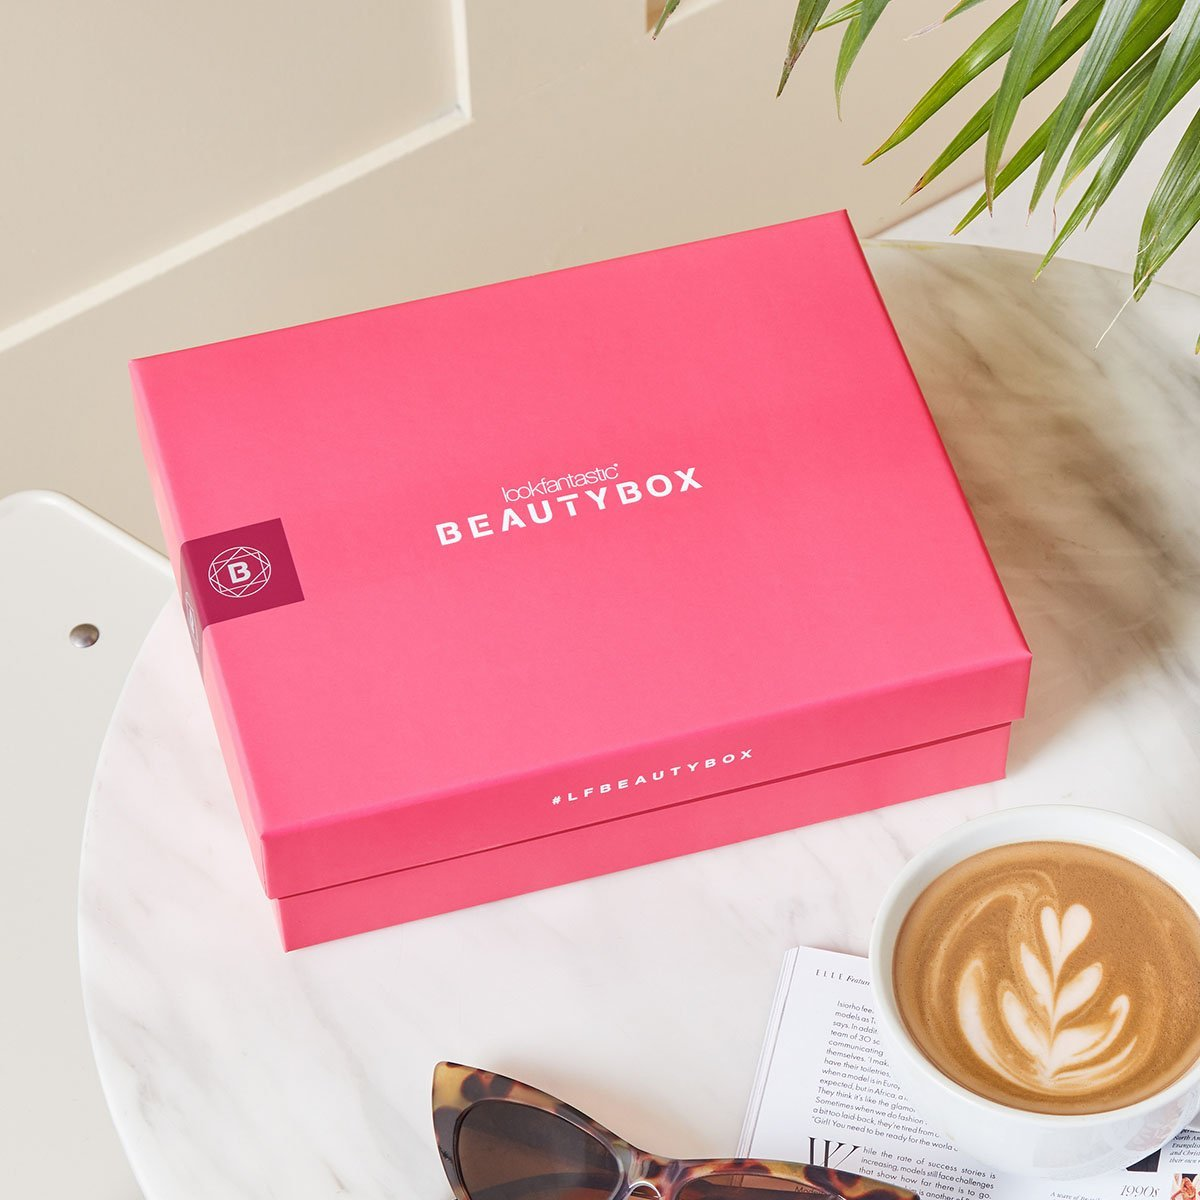 Ontdek de lookfantastic februari Amour Beauty Box